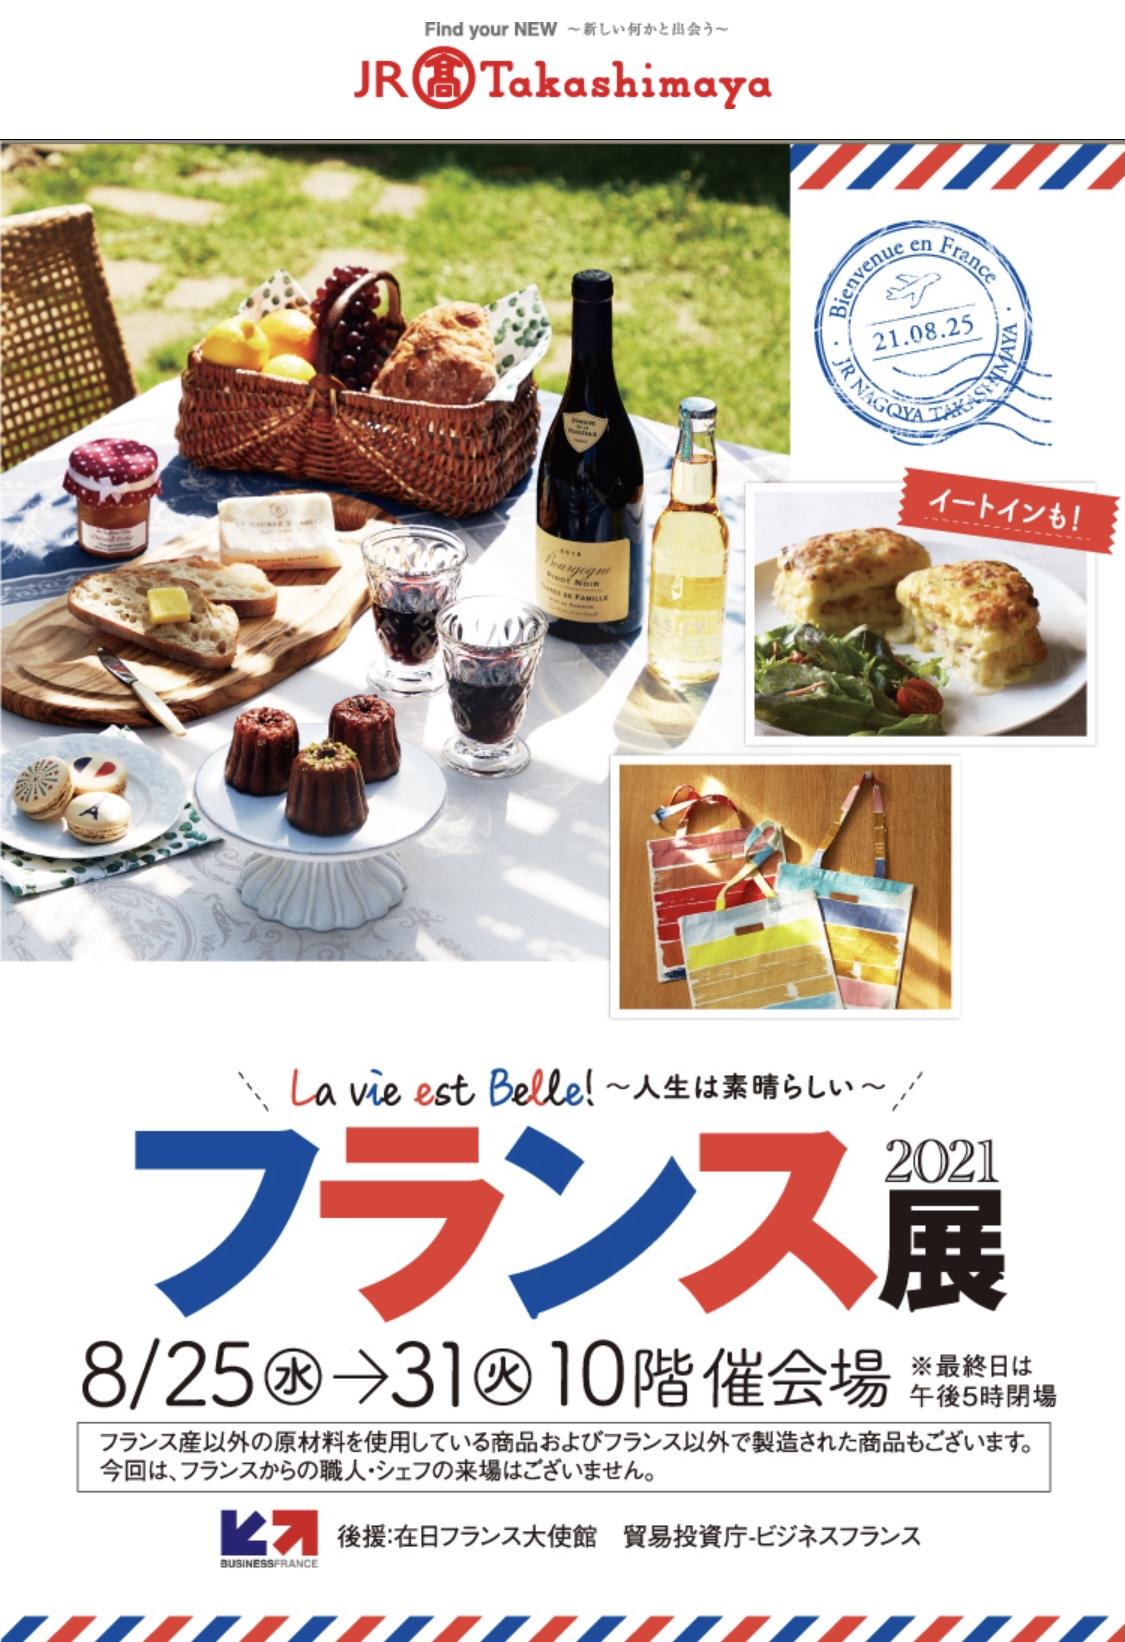 【POP-UP】JR名古屋高島屋-フランスフェア2021- 8/25(水)-8/31(火)